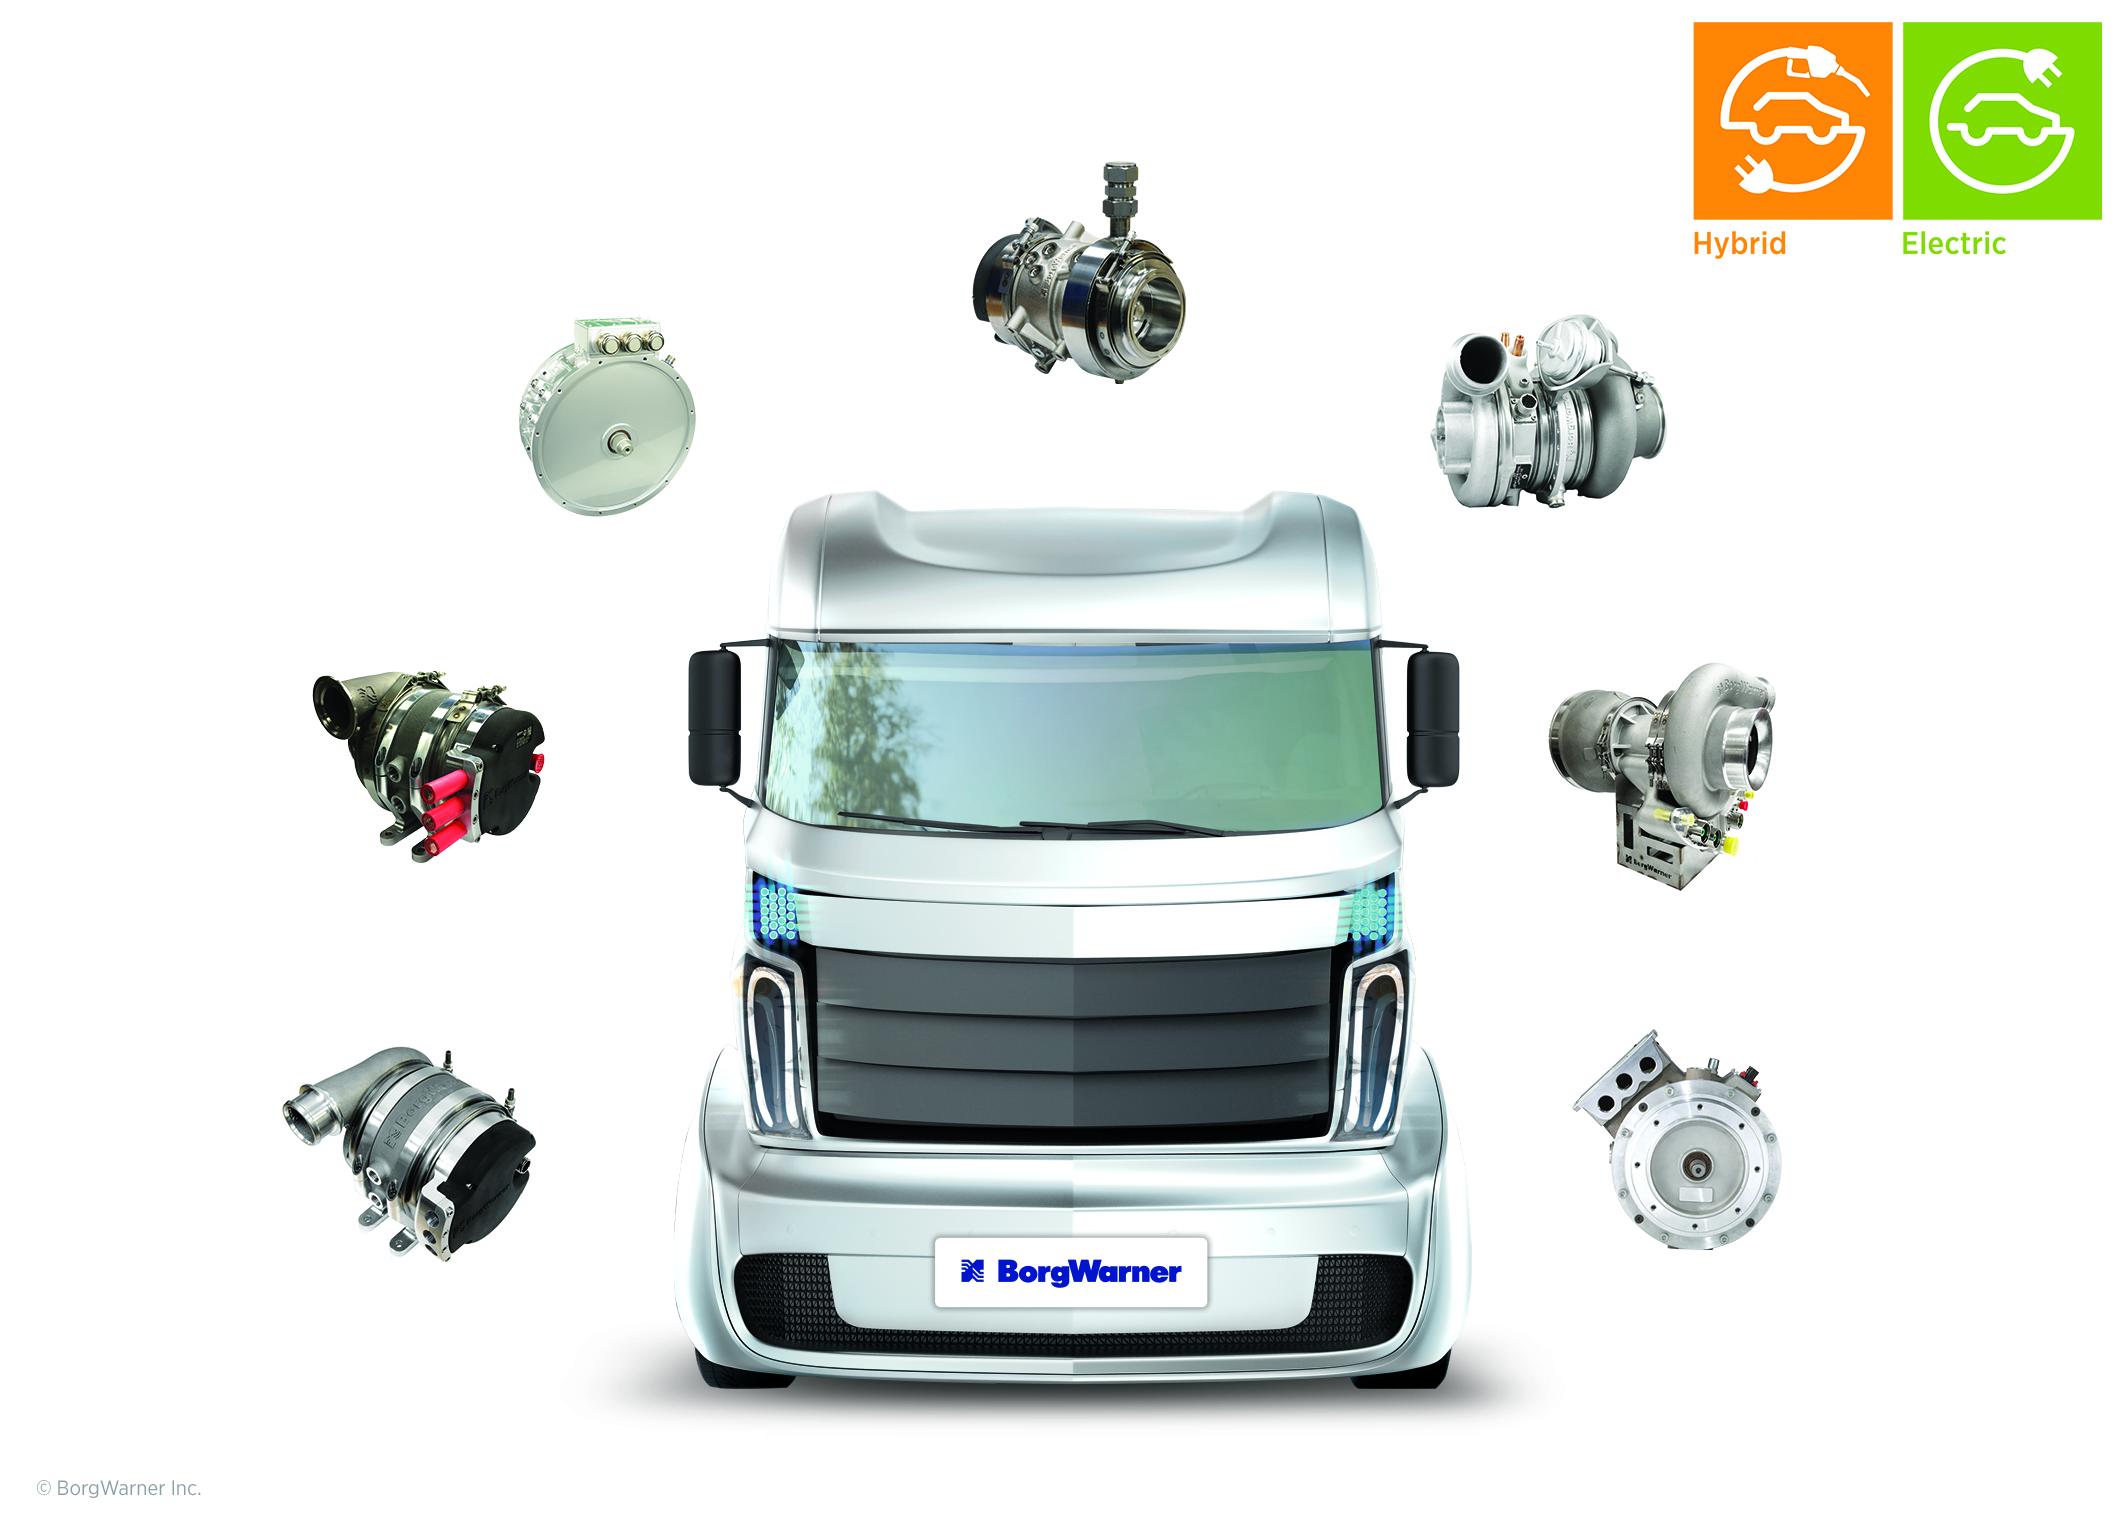 BorgWarner Talks Hybrids, Electric Trucks at NACV Show